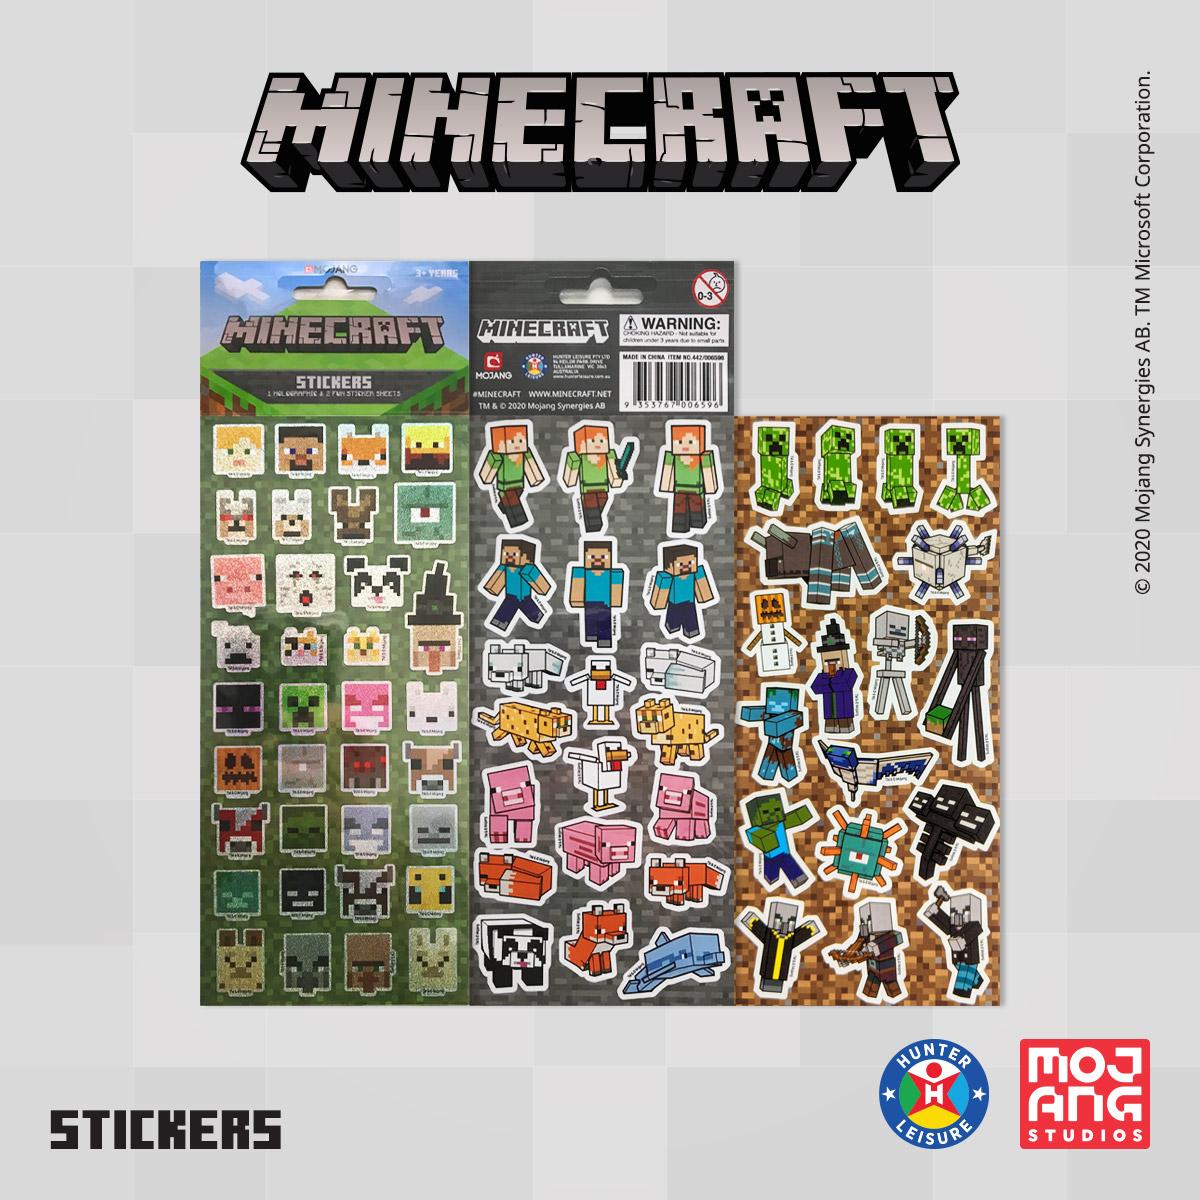 www.hunterleisure.com.au Minecraft Stickers Big W Hunter Leisure